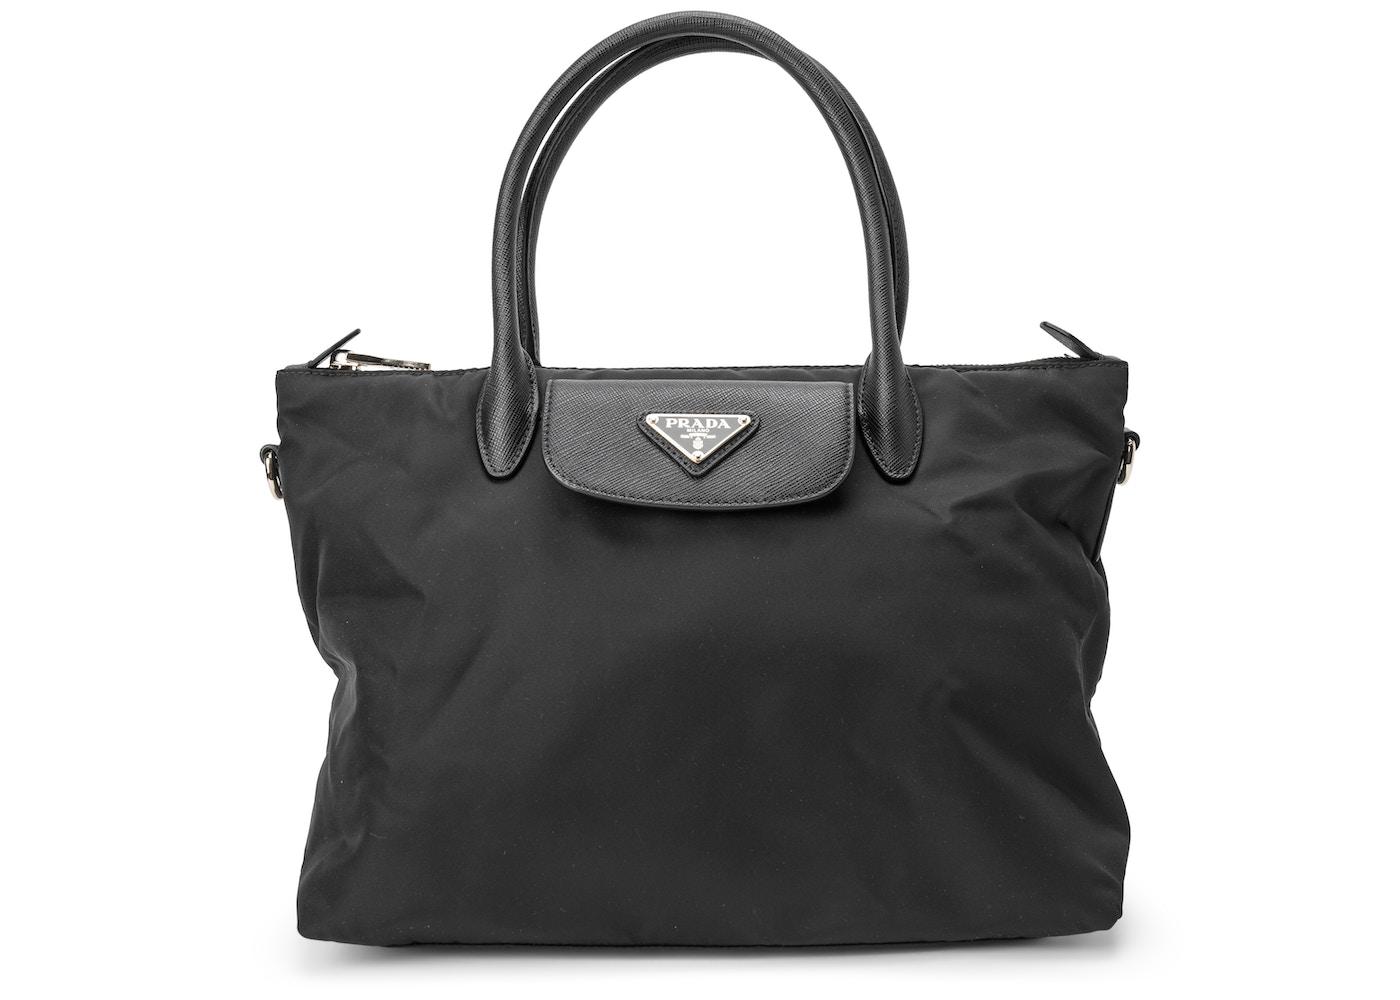 222e19fc25c1 Buy & Sell Prada Handbags - Highest Bid